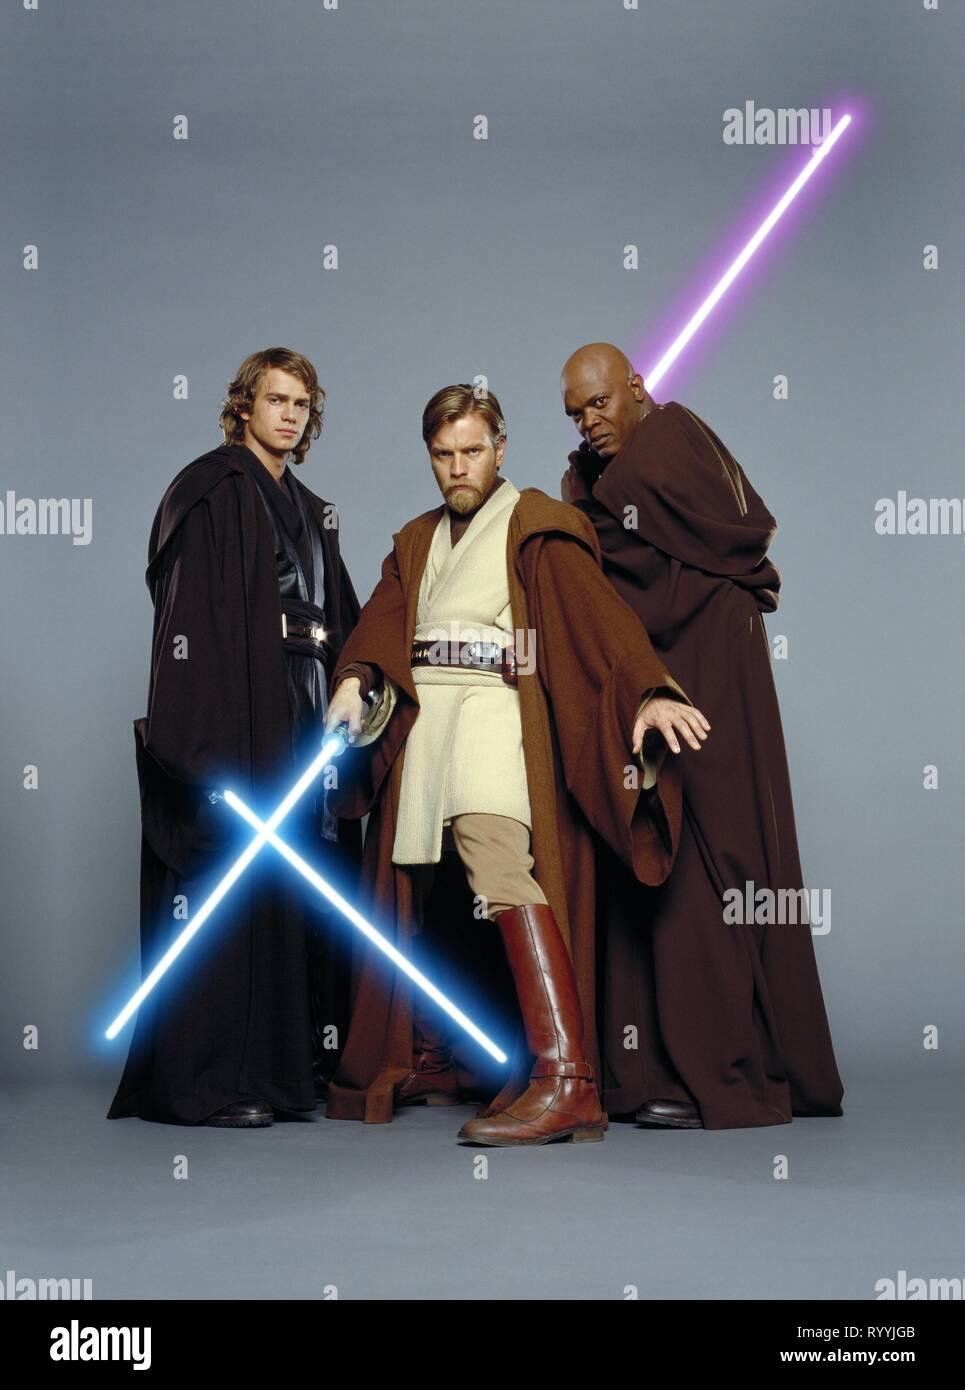 Hayden Christensen Ewan Mcgregor Samuel L Jackson Star Wars Episode Iii Revenge Of The Sith 2005 Stock Photo Alamy